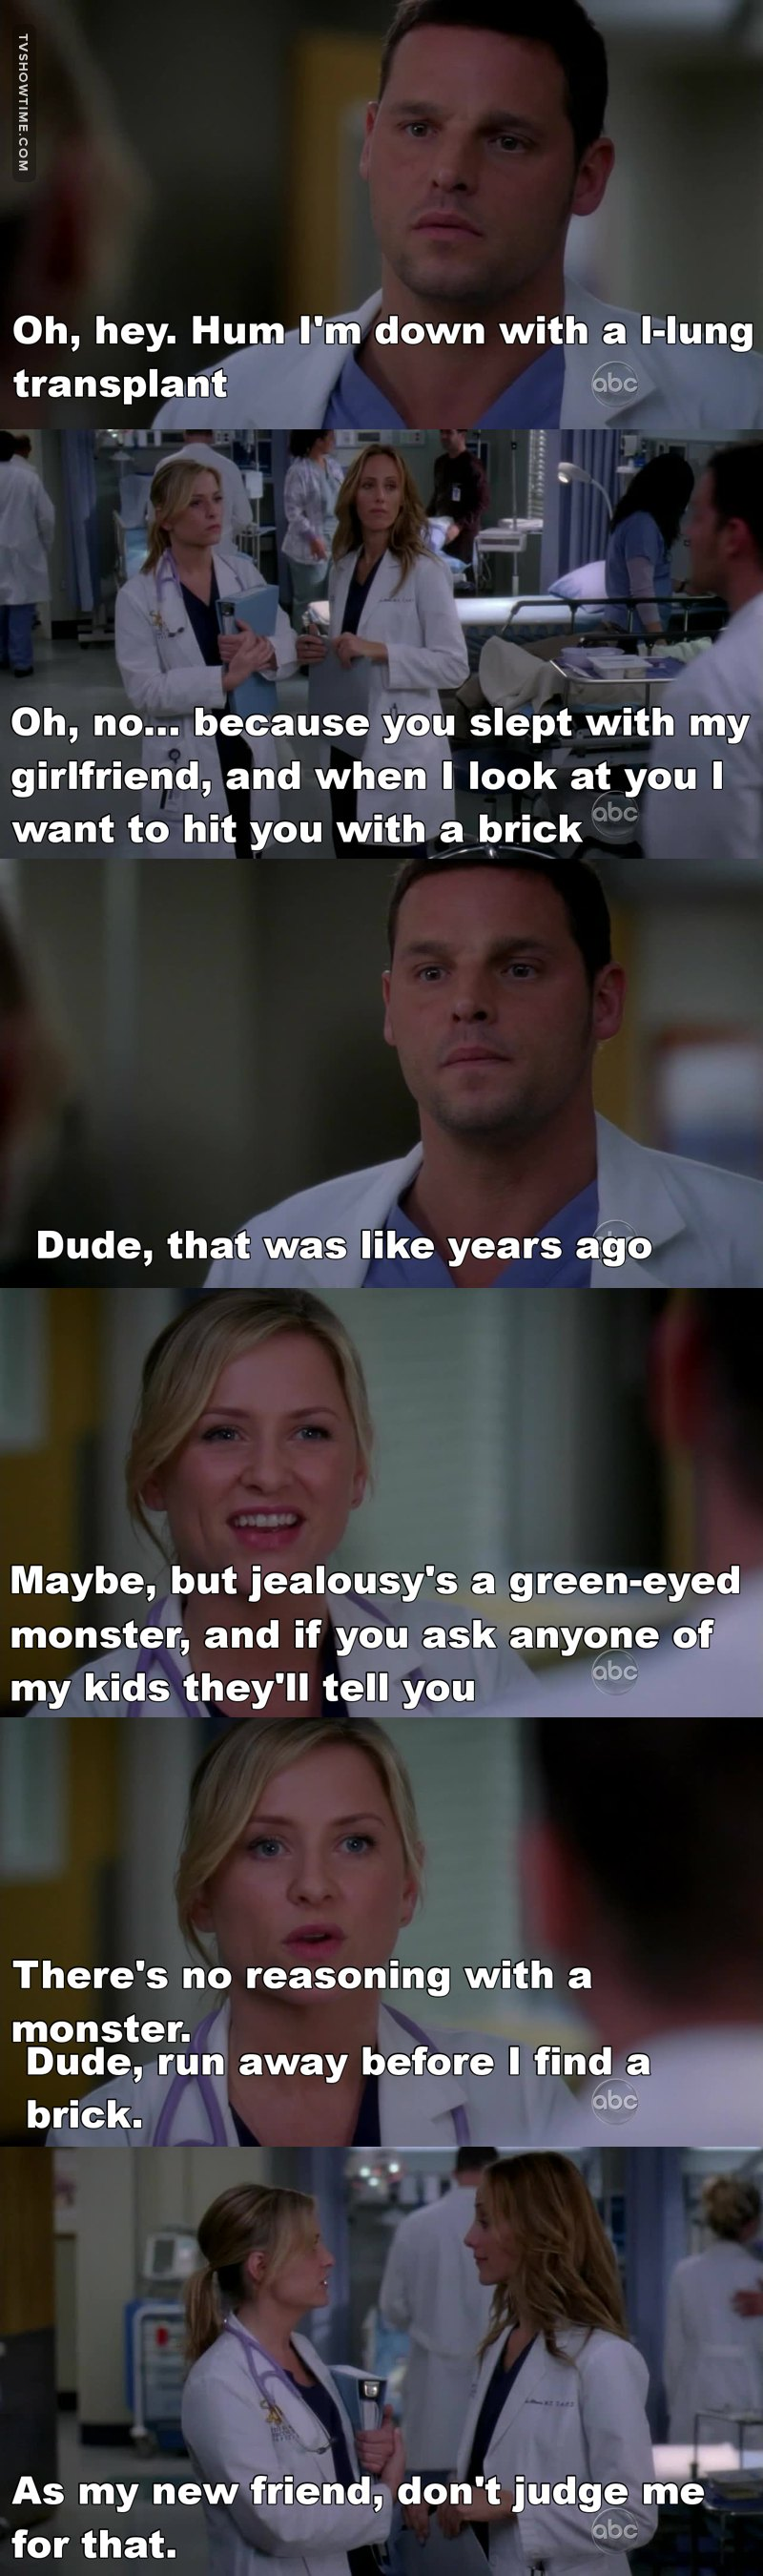 This scene made me laugh so hard I love Arizona